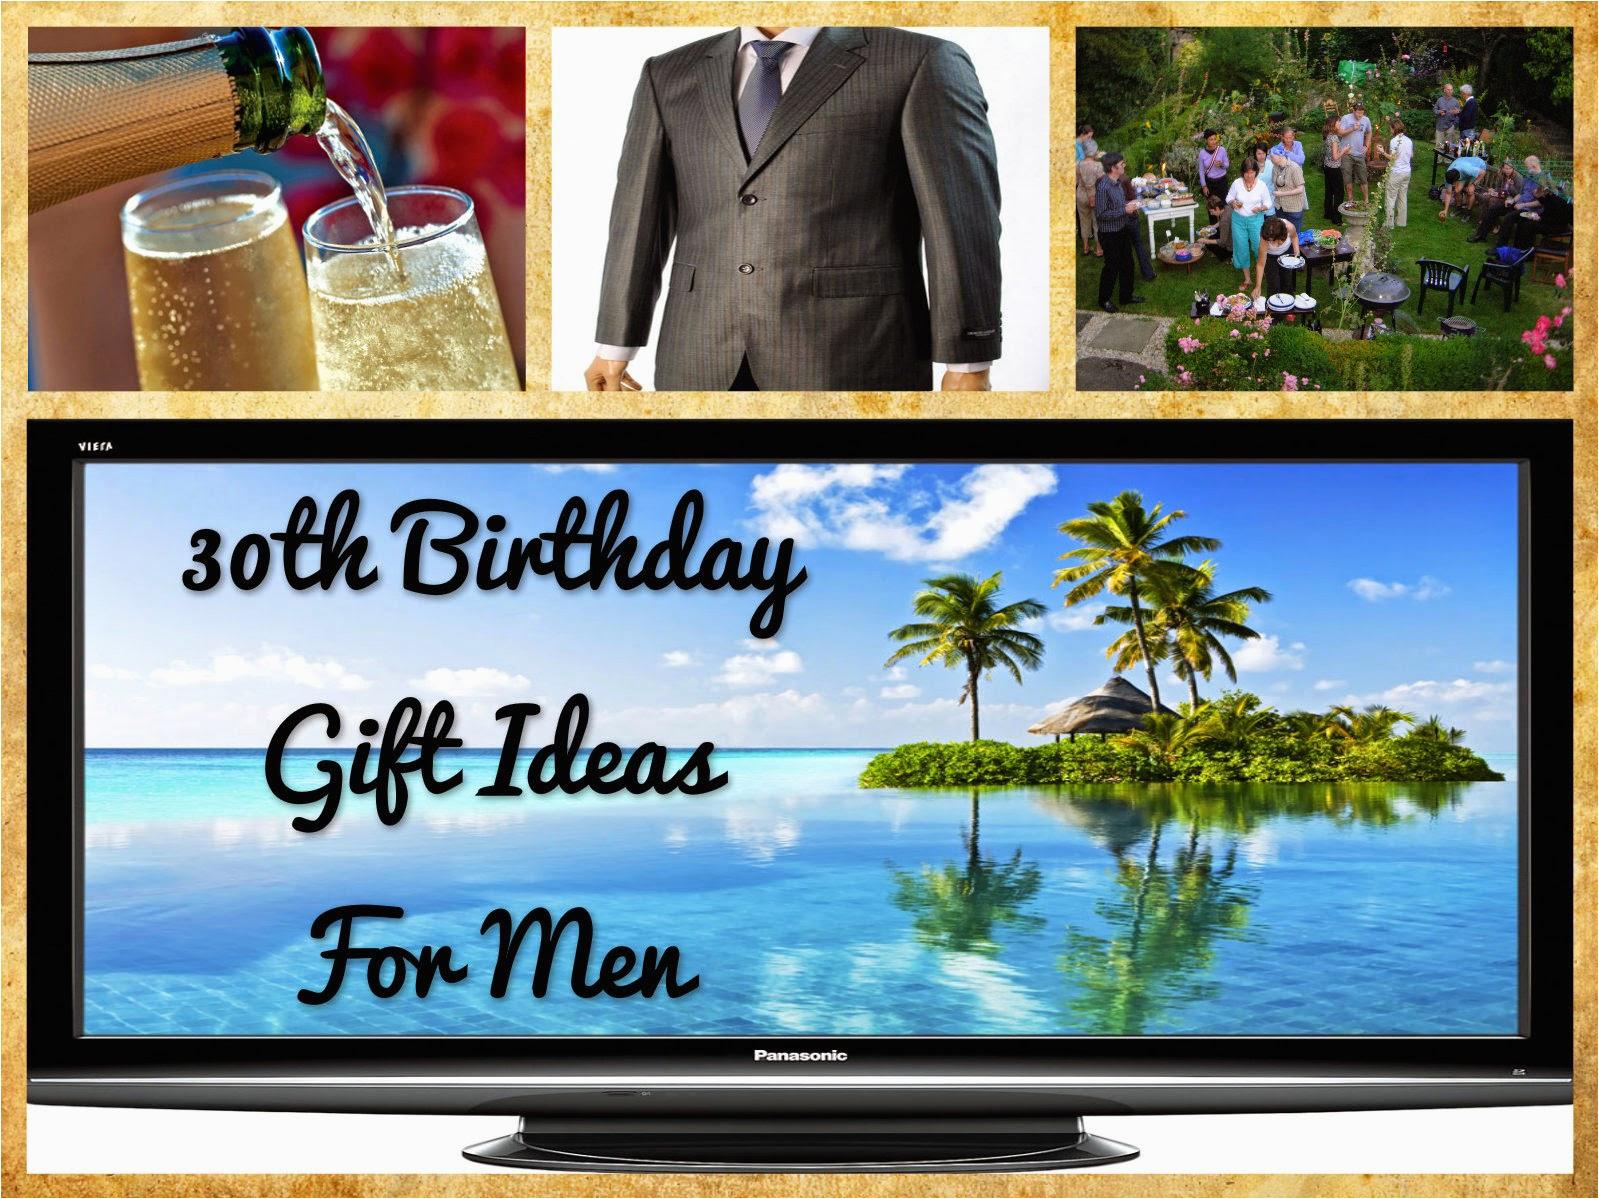 30th birthday gift ideas for men